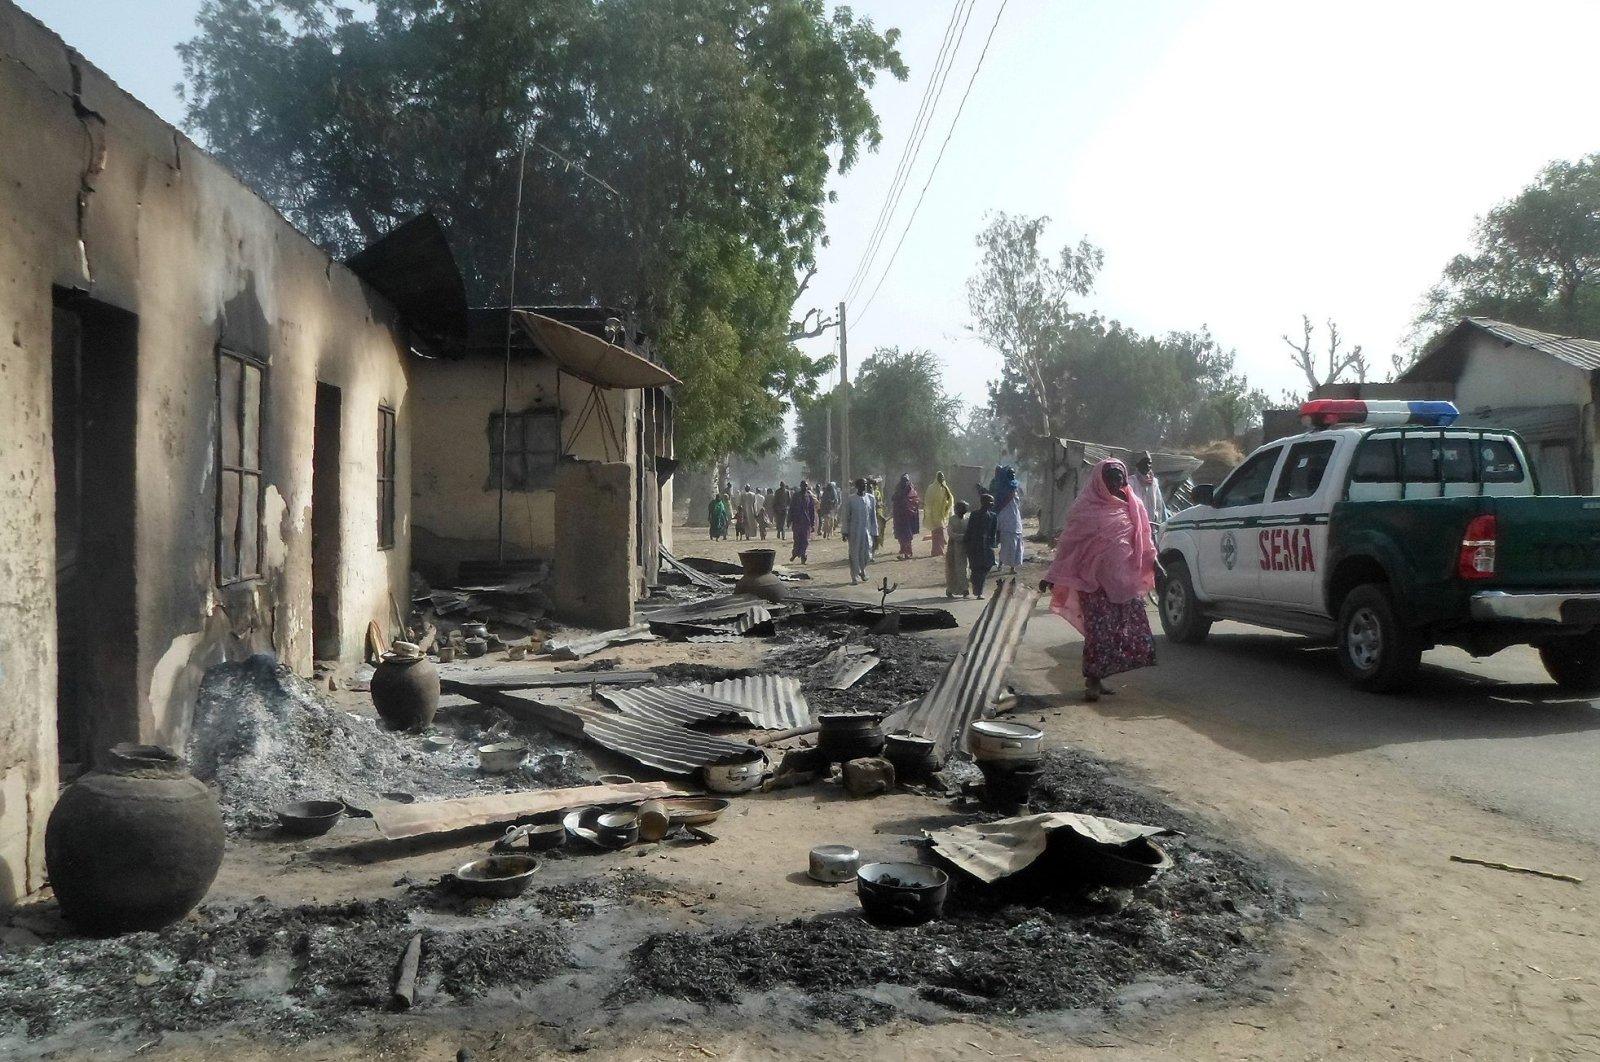 People walk past burnt houses after Boko Haram attacks in Dalori village on the outskirts of Maiduguri in northeastern Nigeria, Jan. 31, 2016. (AFP Photo)